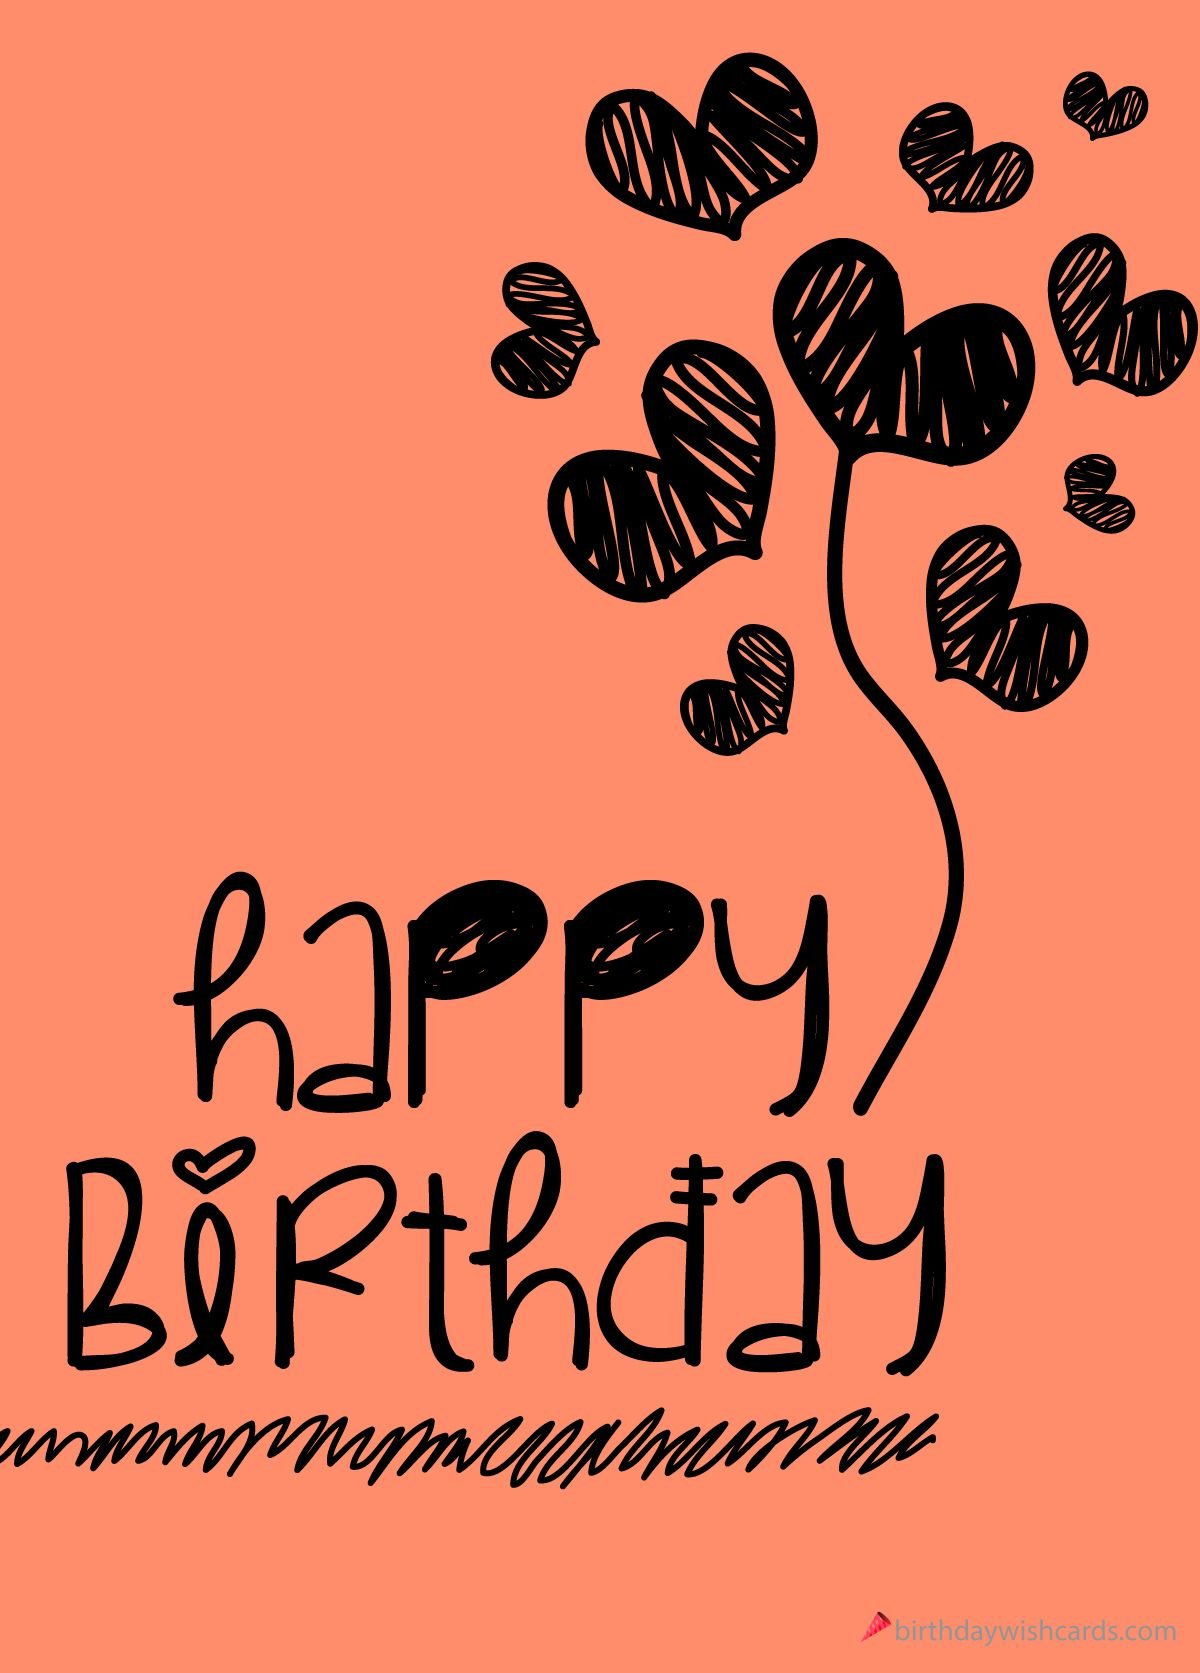 Happy Birthday Digital Hand Drawing Happy Birthday Drawings Happy Birthday Friend Birthday Card Drawing